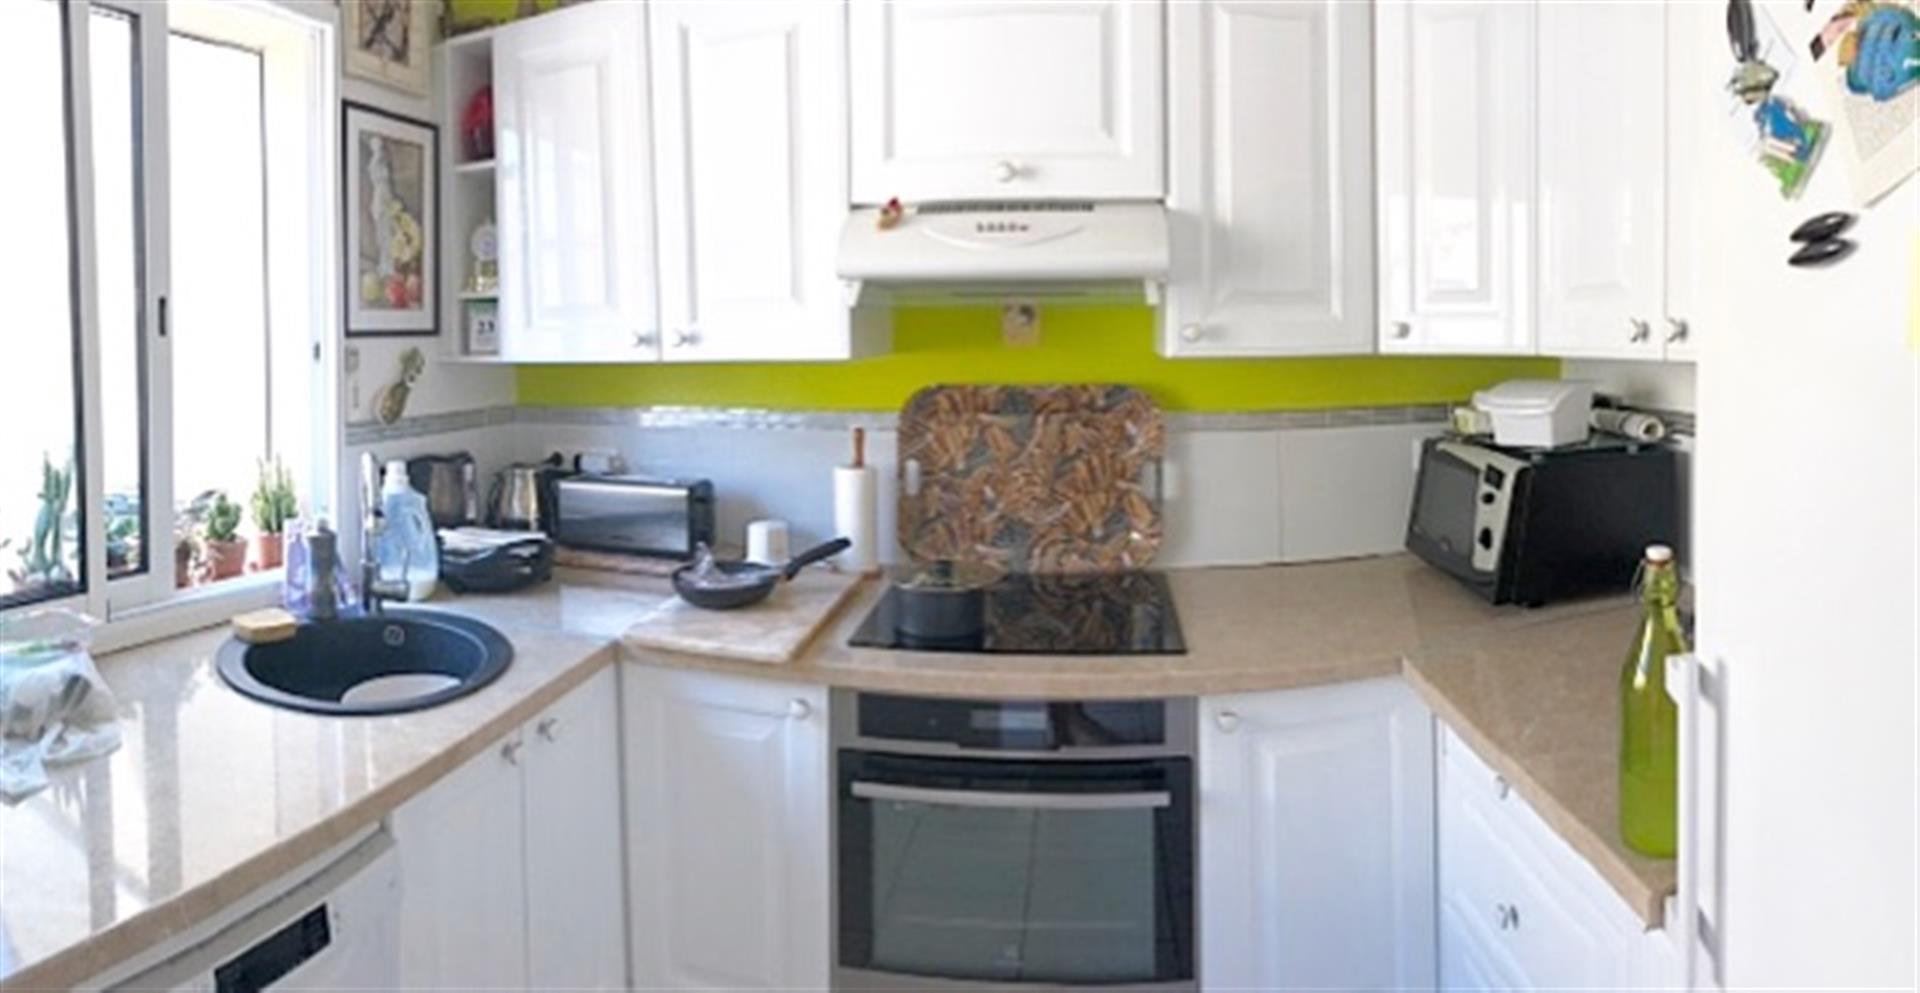 vente maison individuelle 80 m2 cour 2 garages. Black Bedroom Furniture Sets. Home Design Ideas